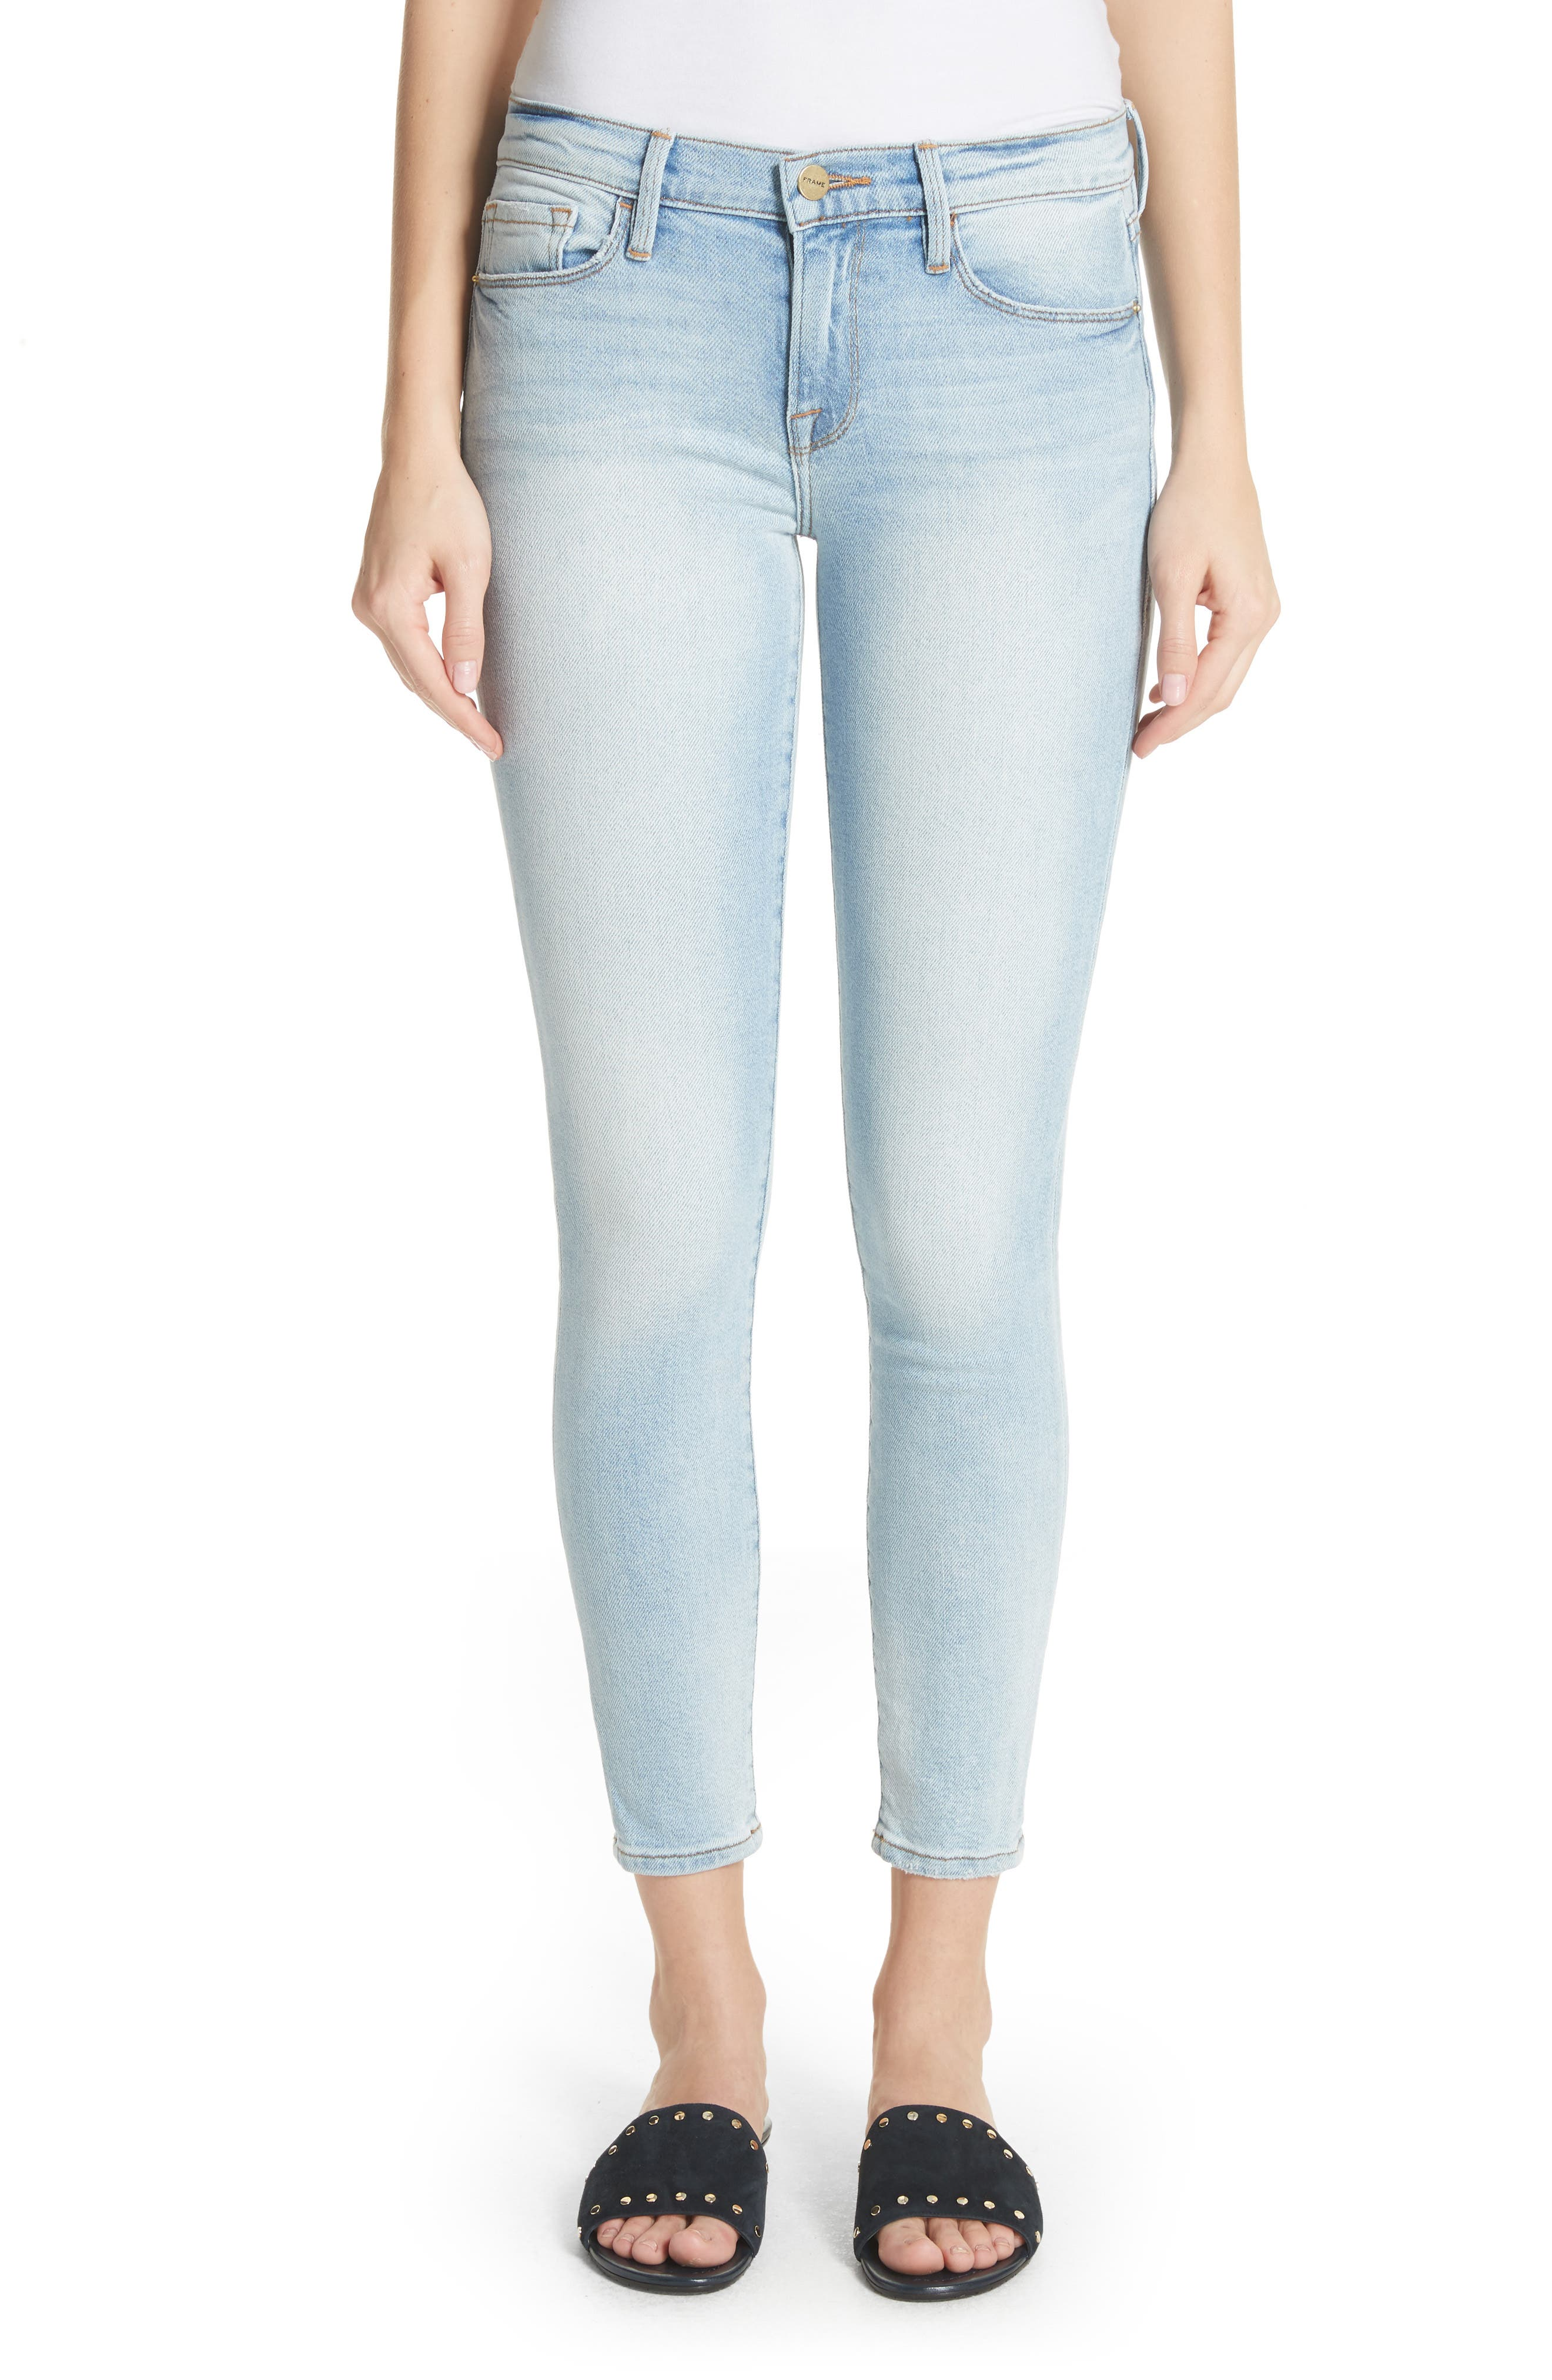 Le Skinny de Jeanne Ankle Jeans,                             Main thumbnail 1, color,                             Adeline